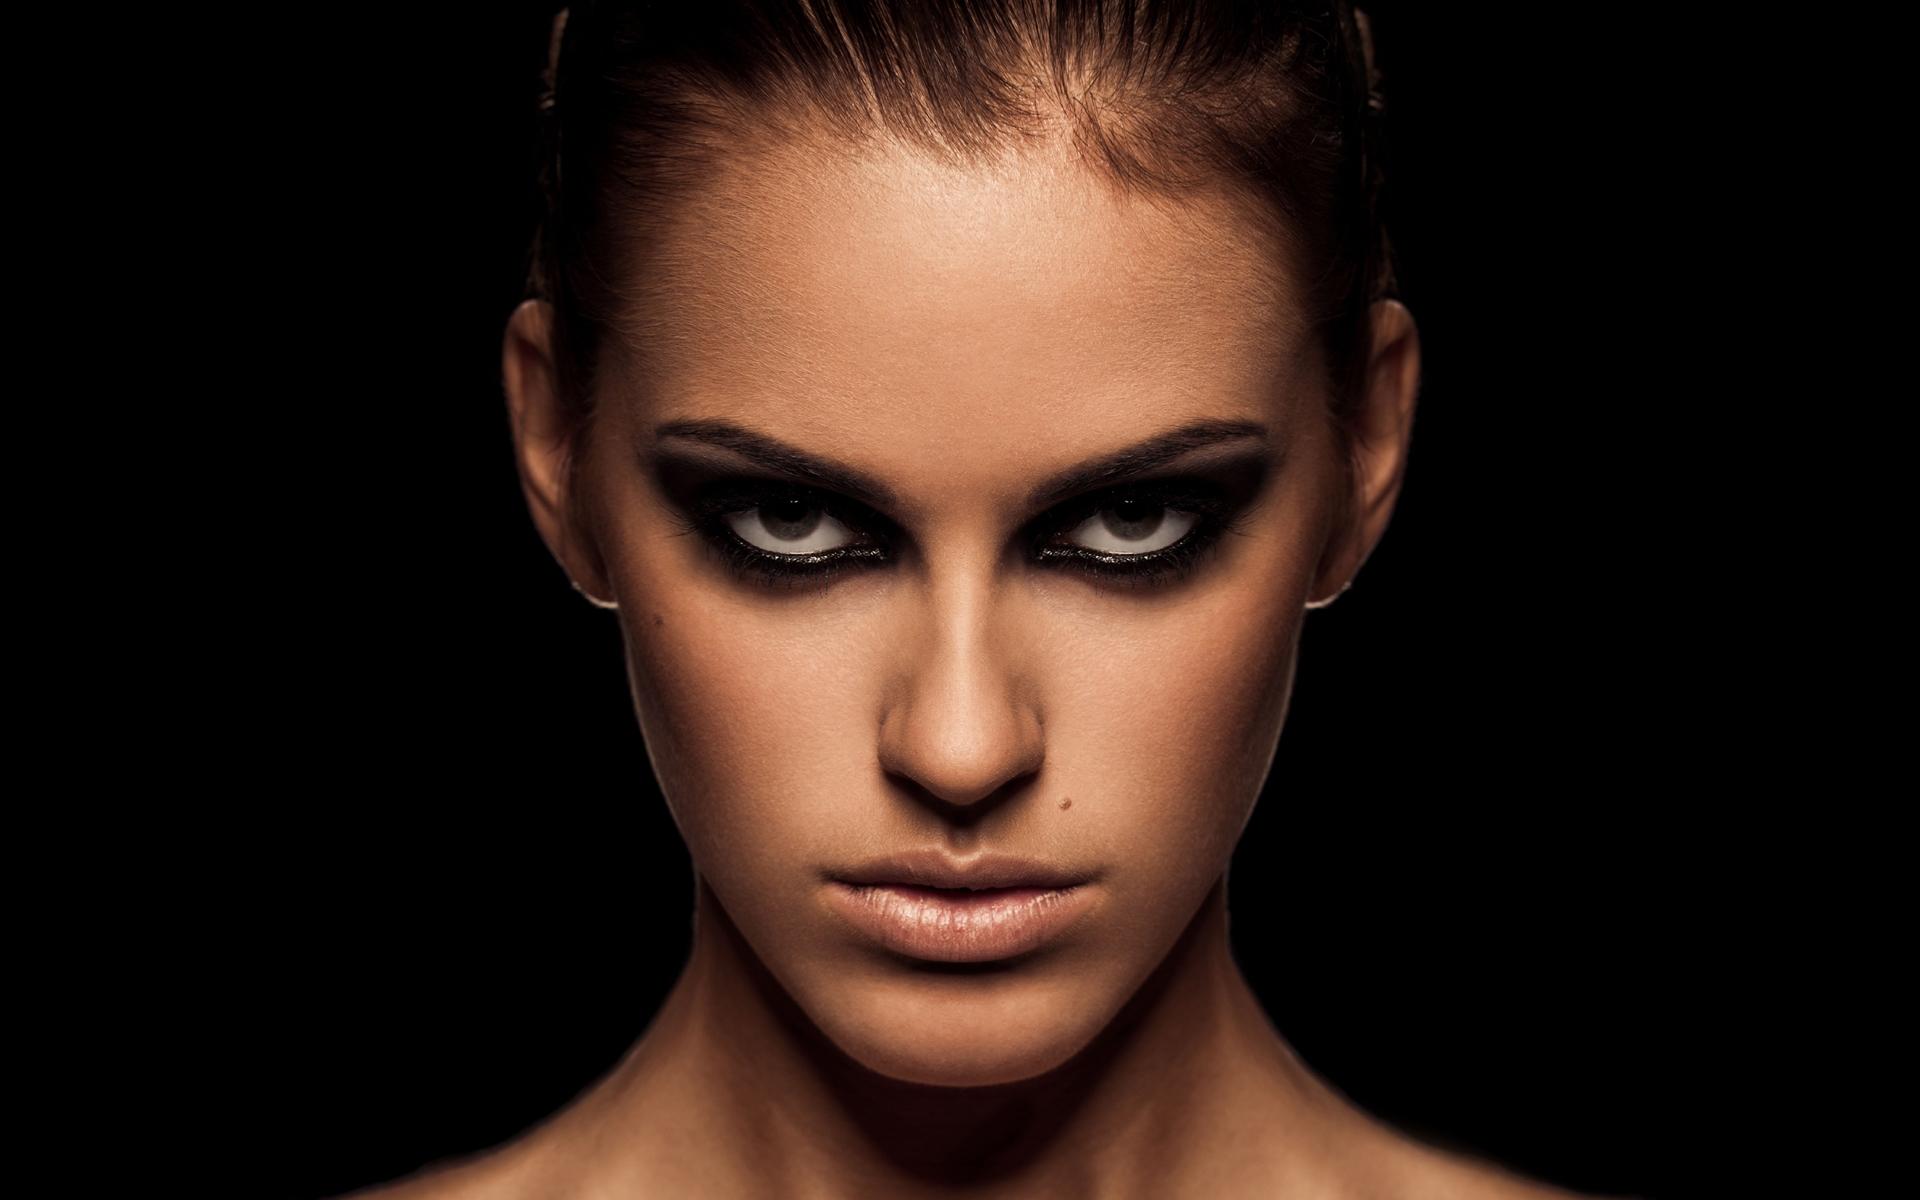 Фото девушки красивая но злая